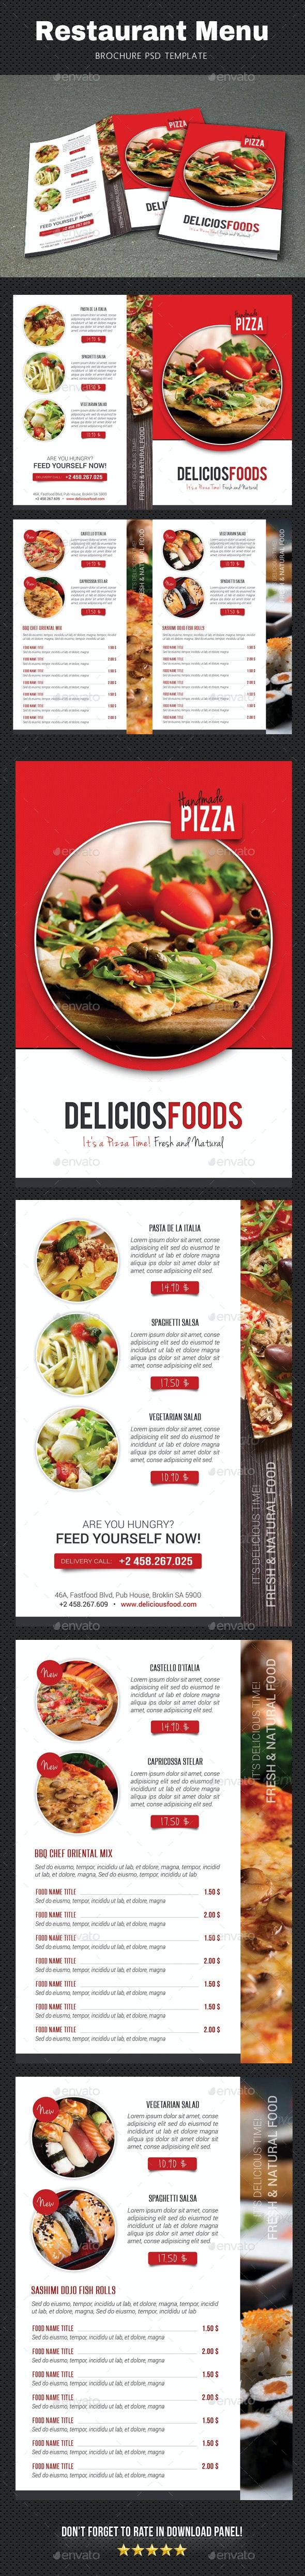 Restaurant Menu Brochure 2 - Food Menus Print Templates